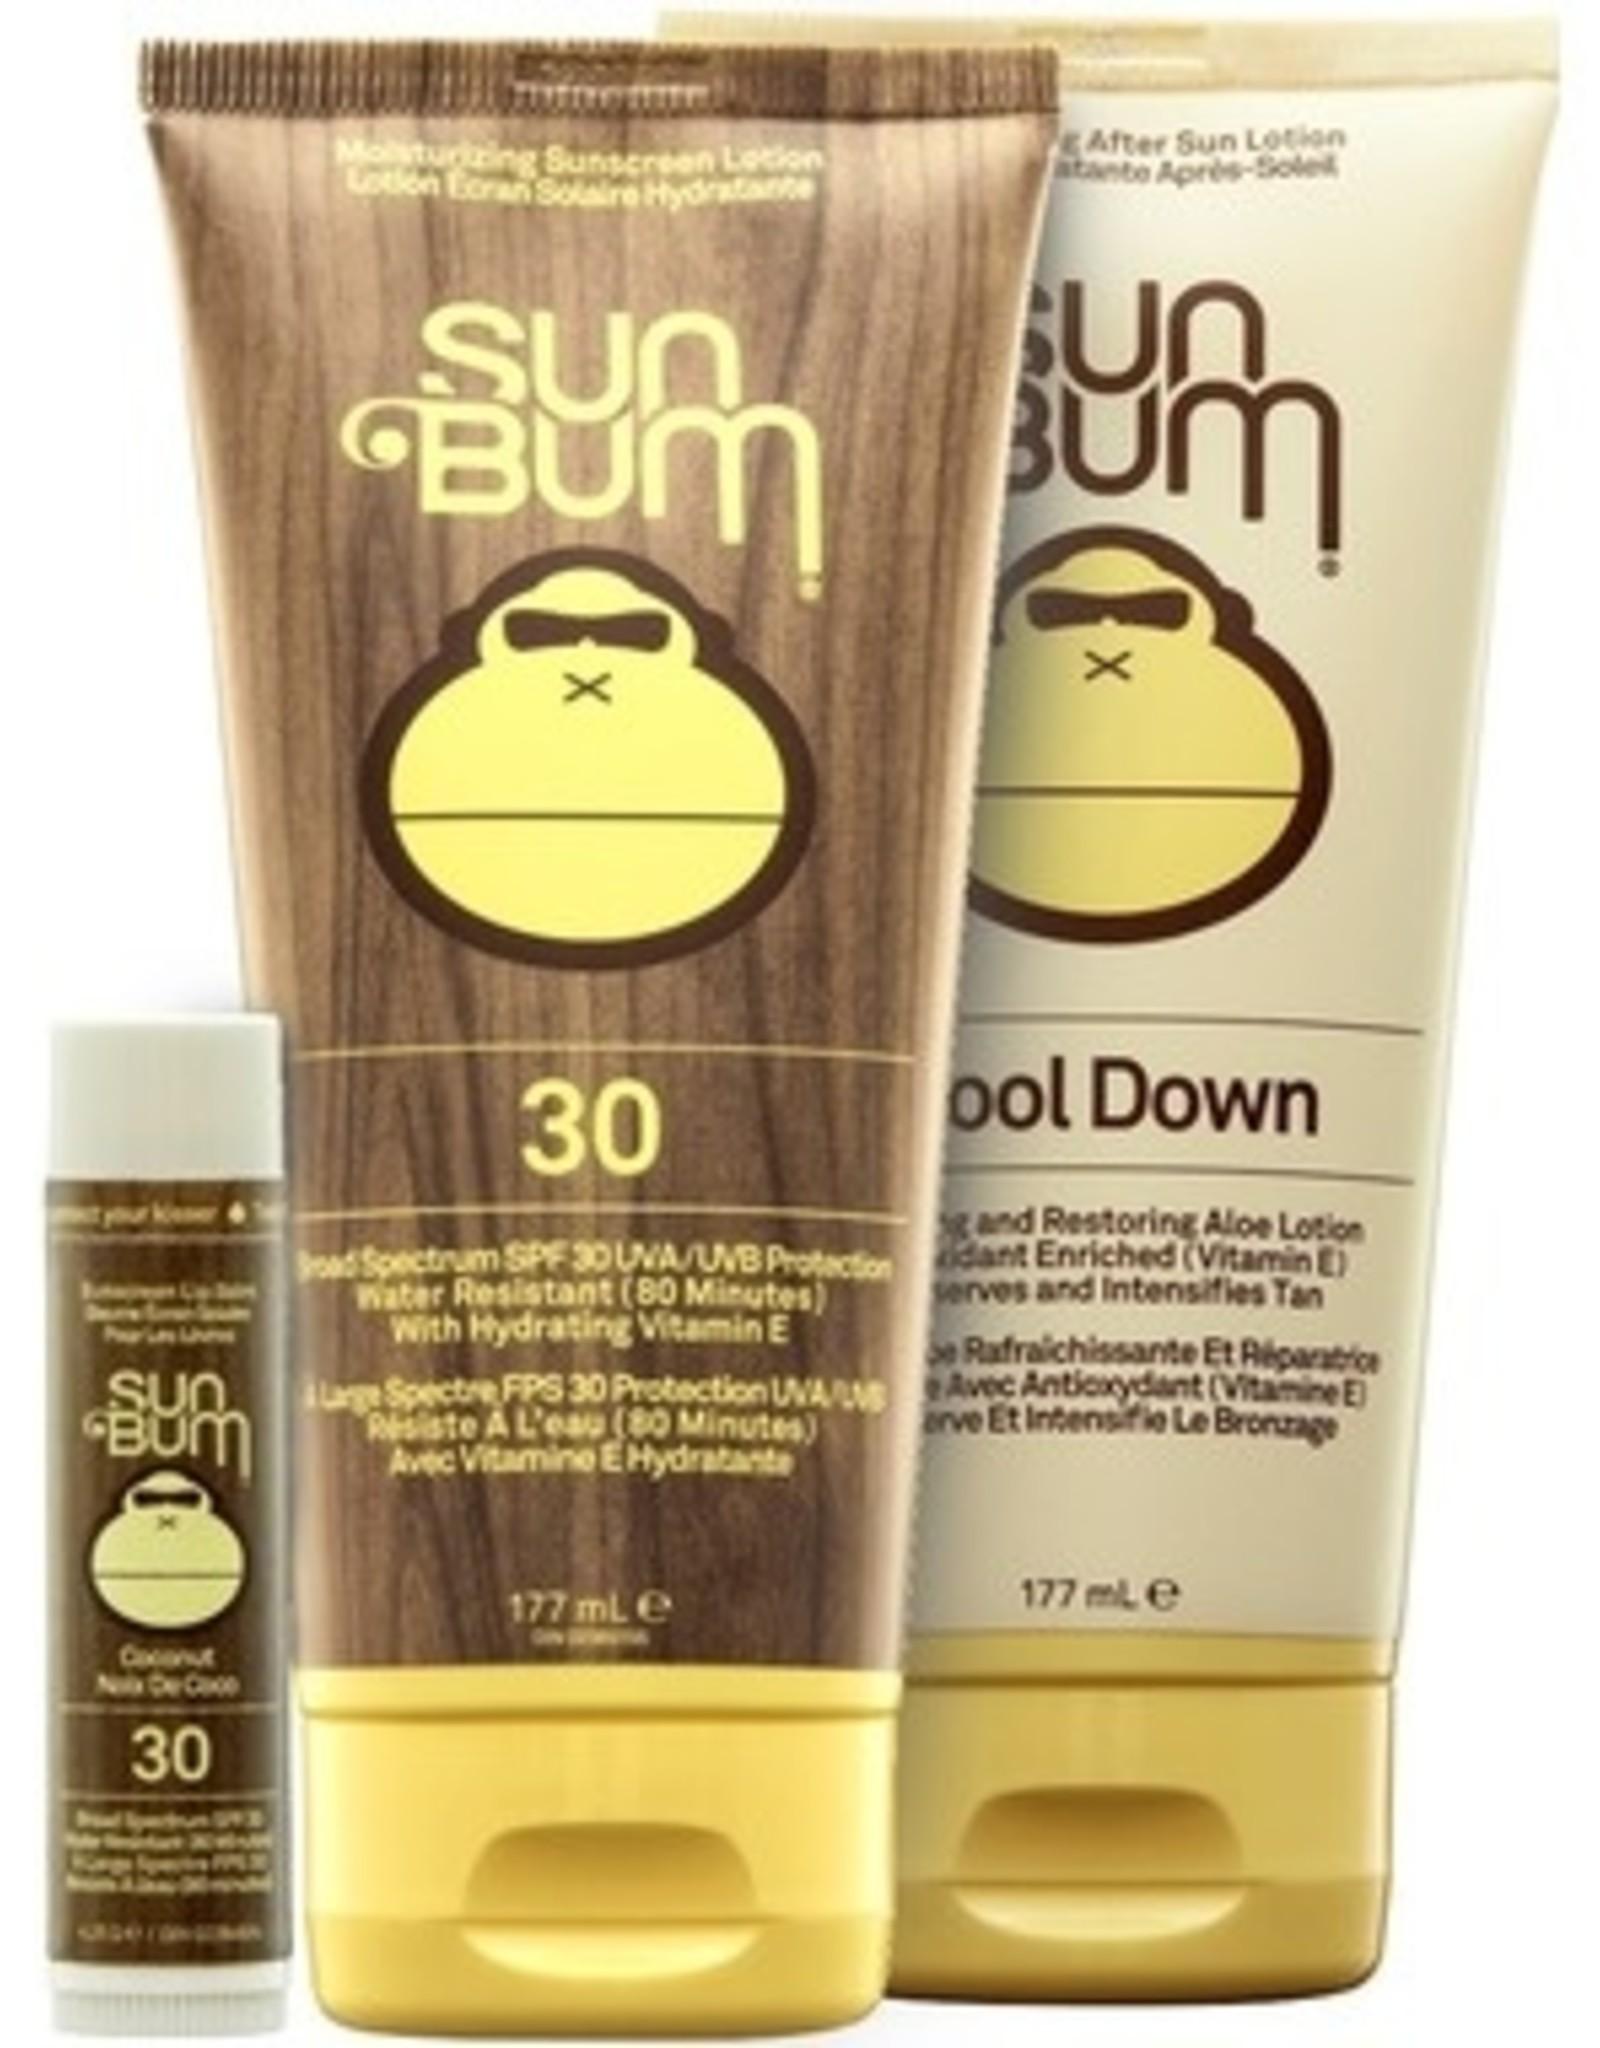 Sun Bum The Getaway Pack